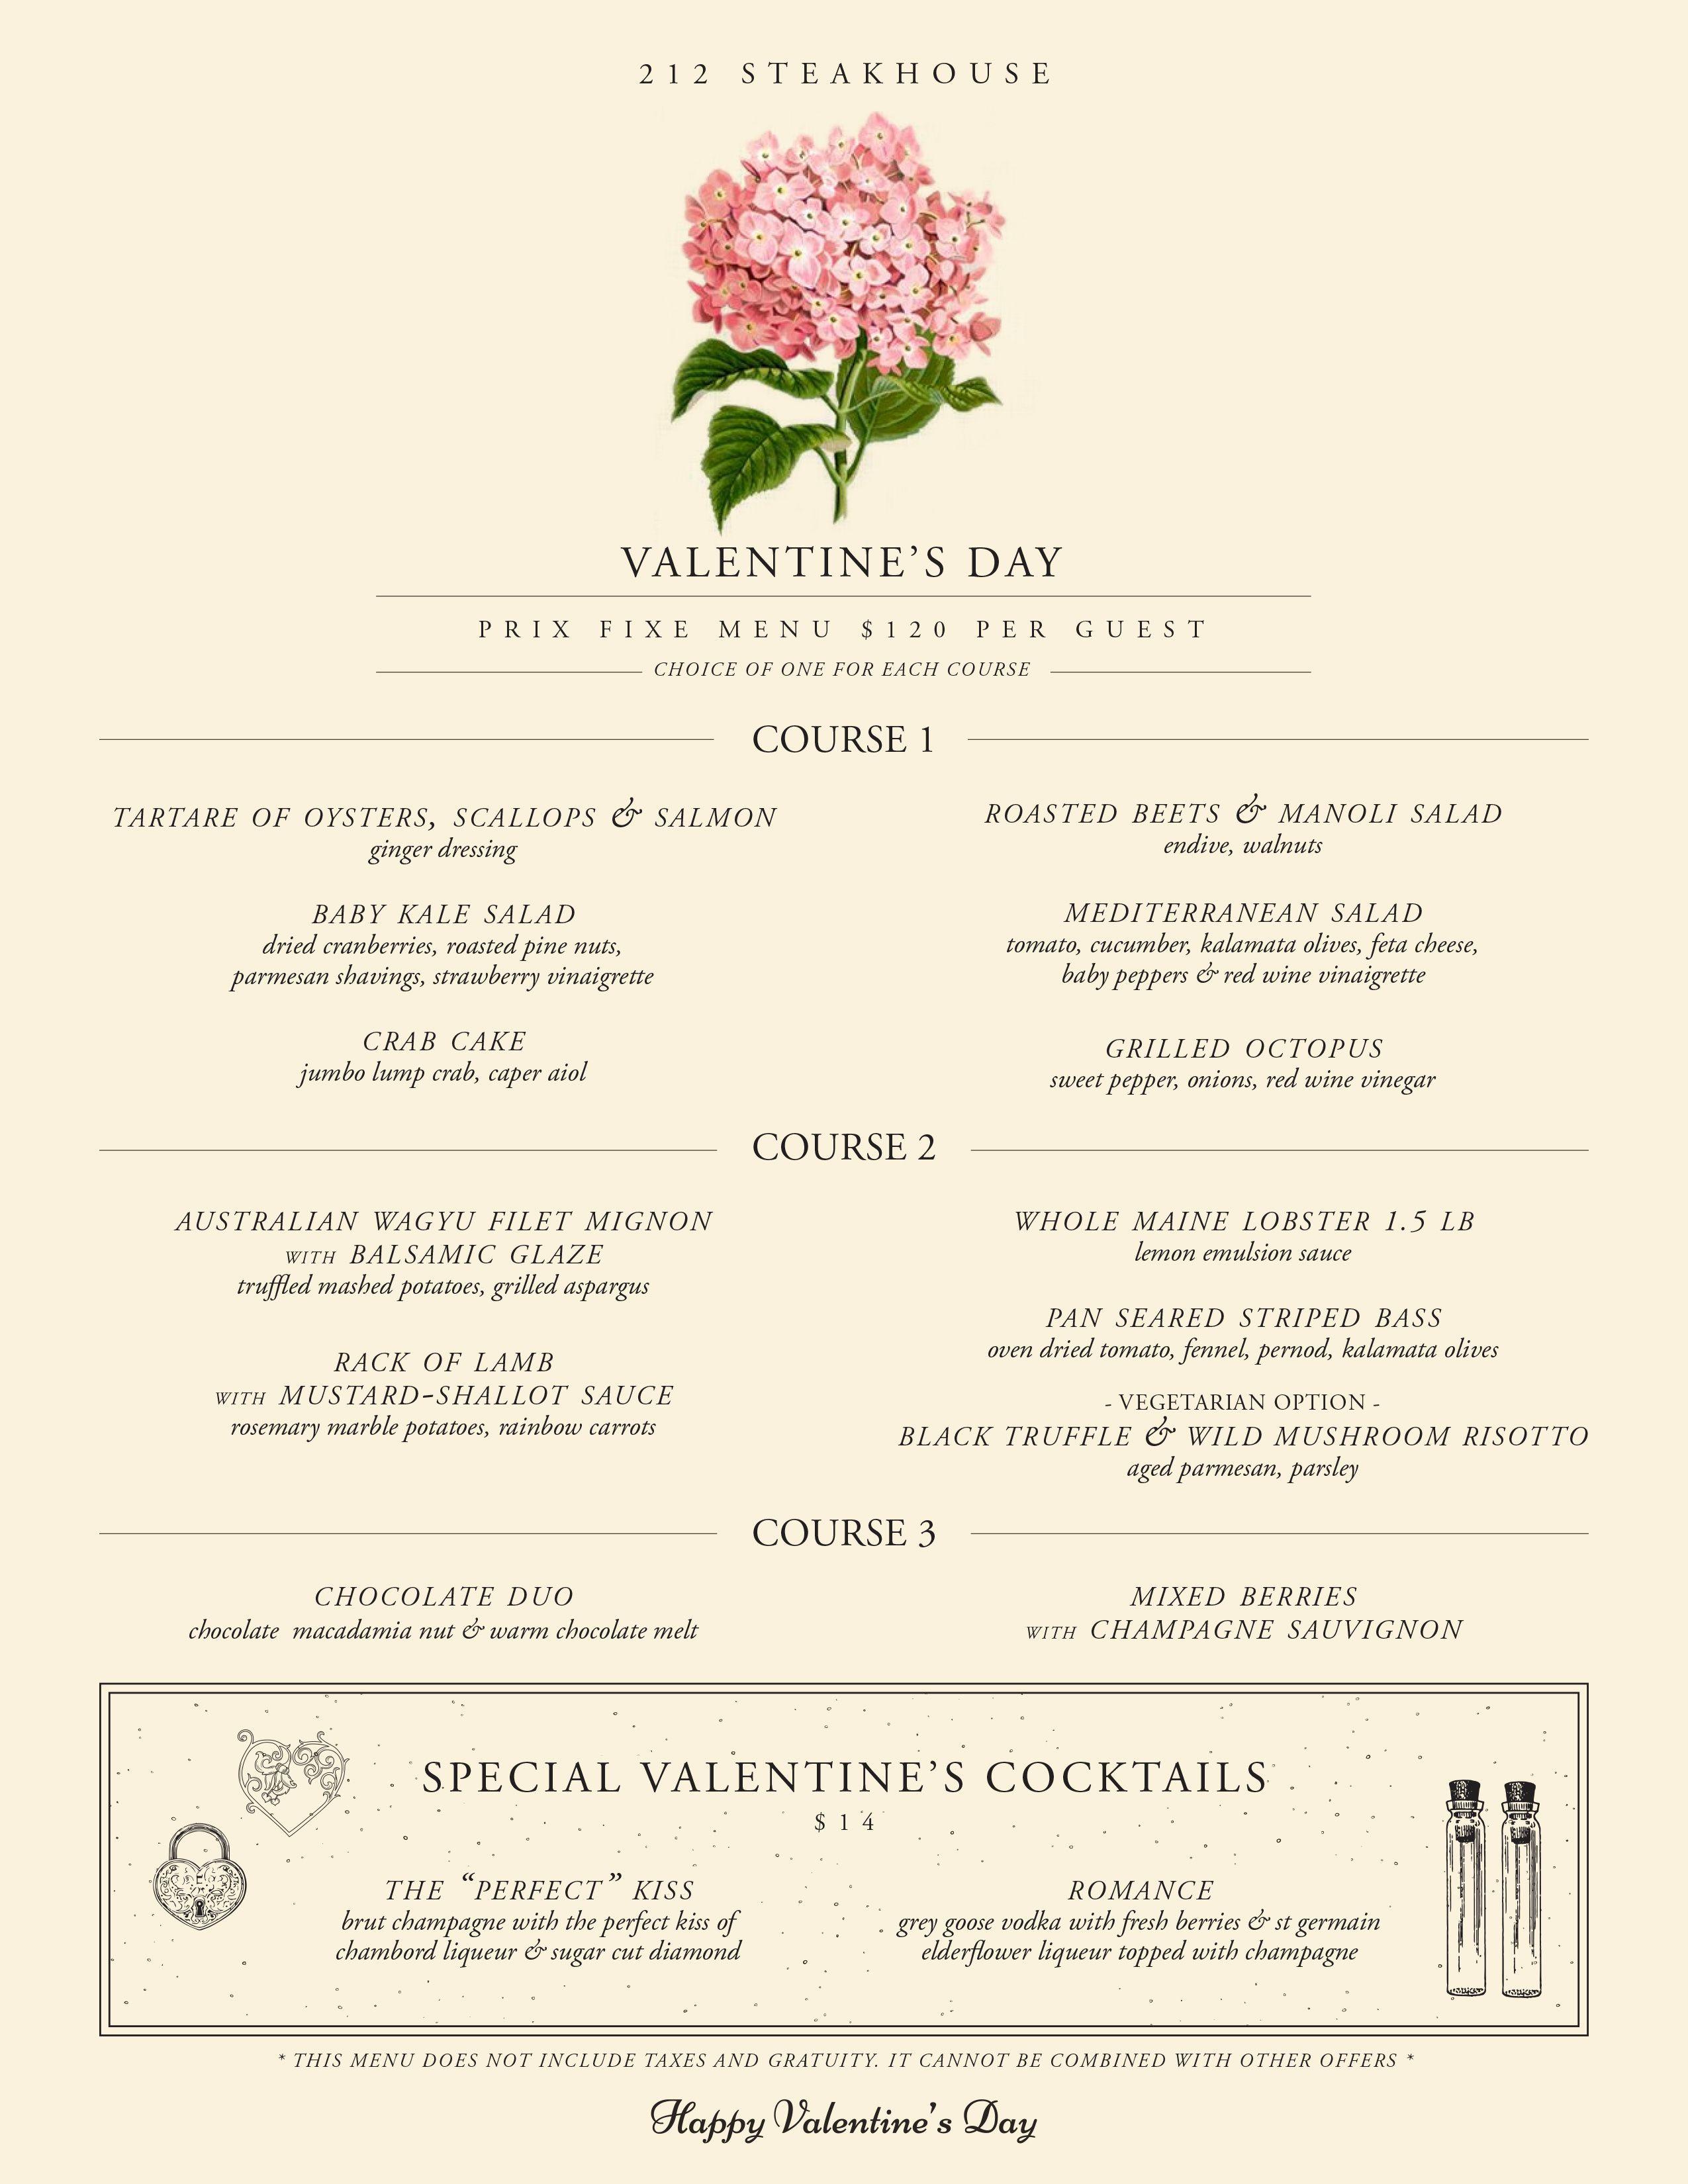 212 Steakhouse Valentine's Day Prix Fixe Menu 2016 Menu Ideas